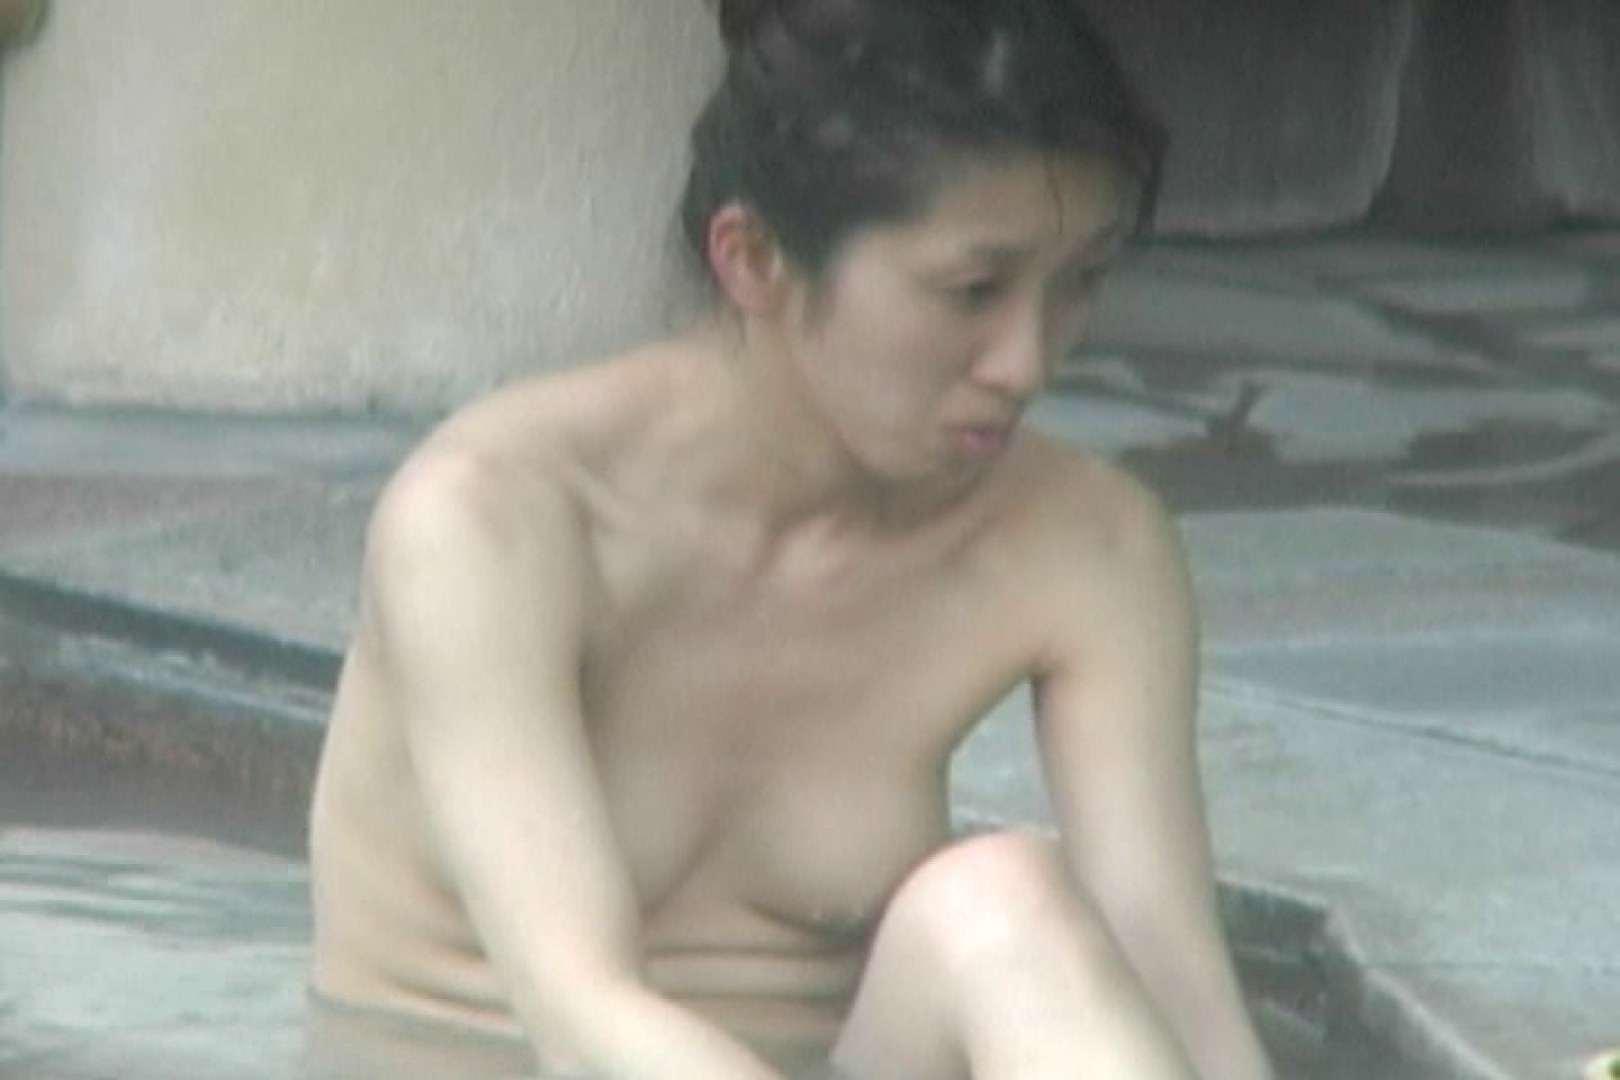 Aquaな露天風呂Vol.588 0  41連発 10